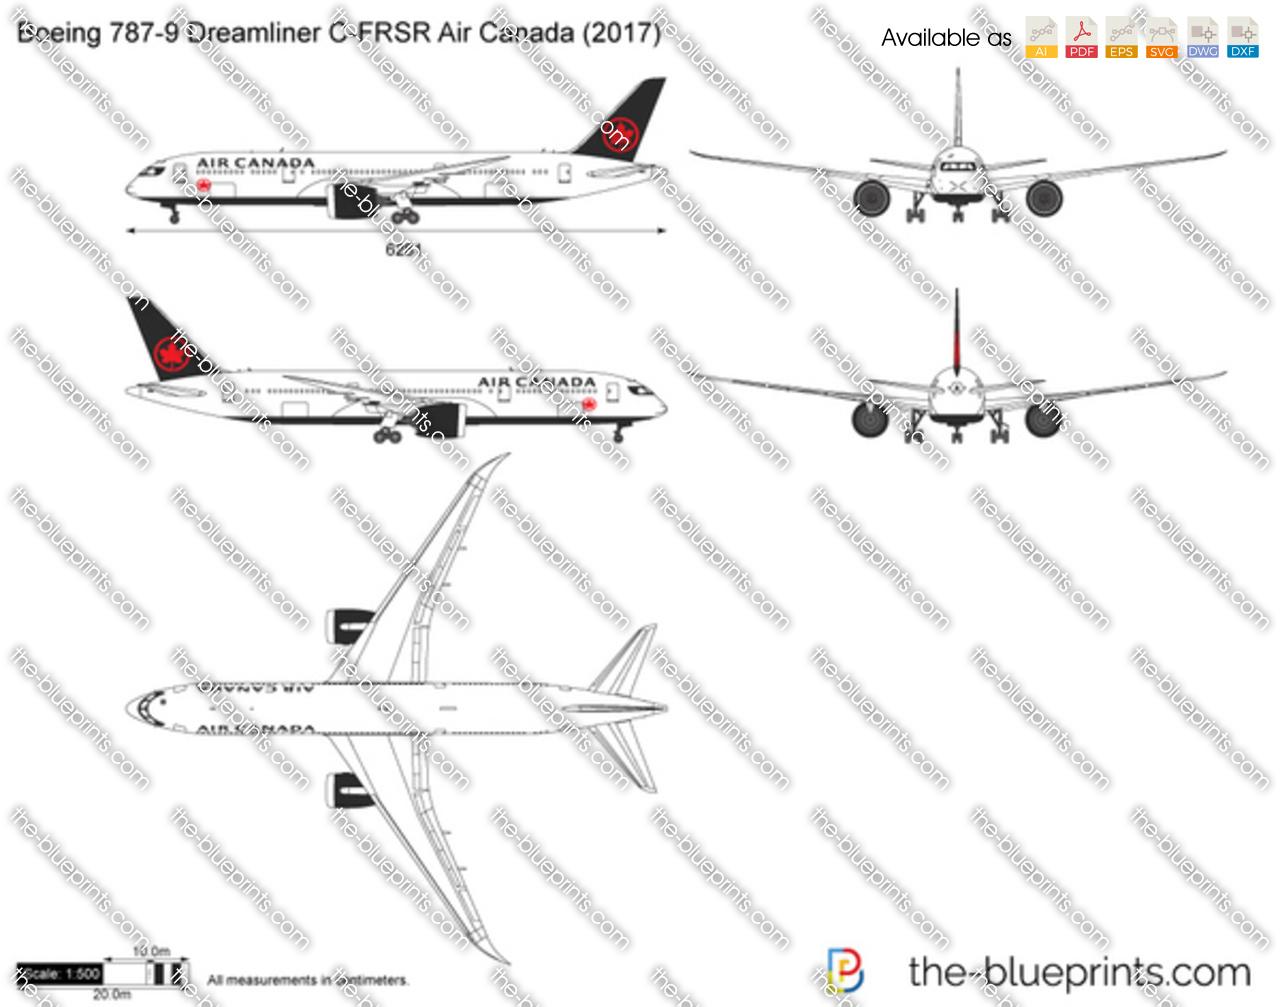 Boeing 787-9 Dreamliner C-FRSR Air Canada 2018